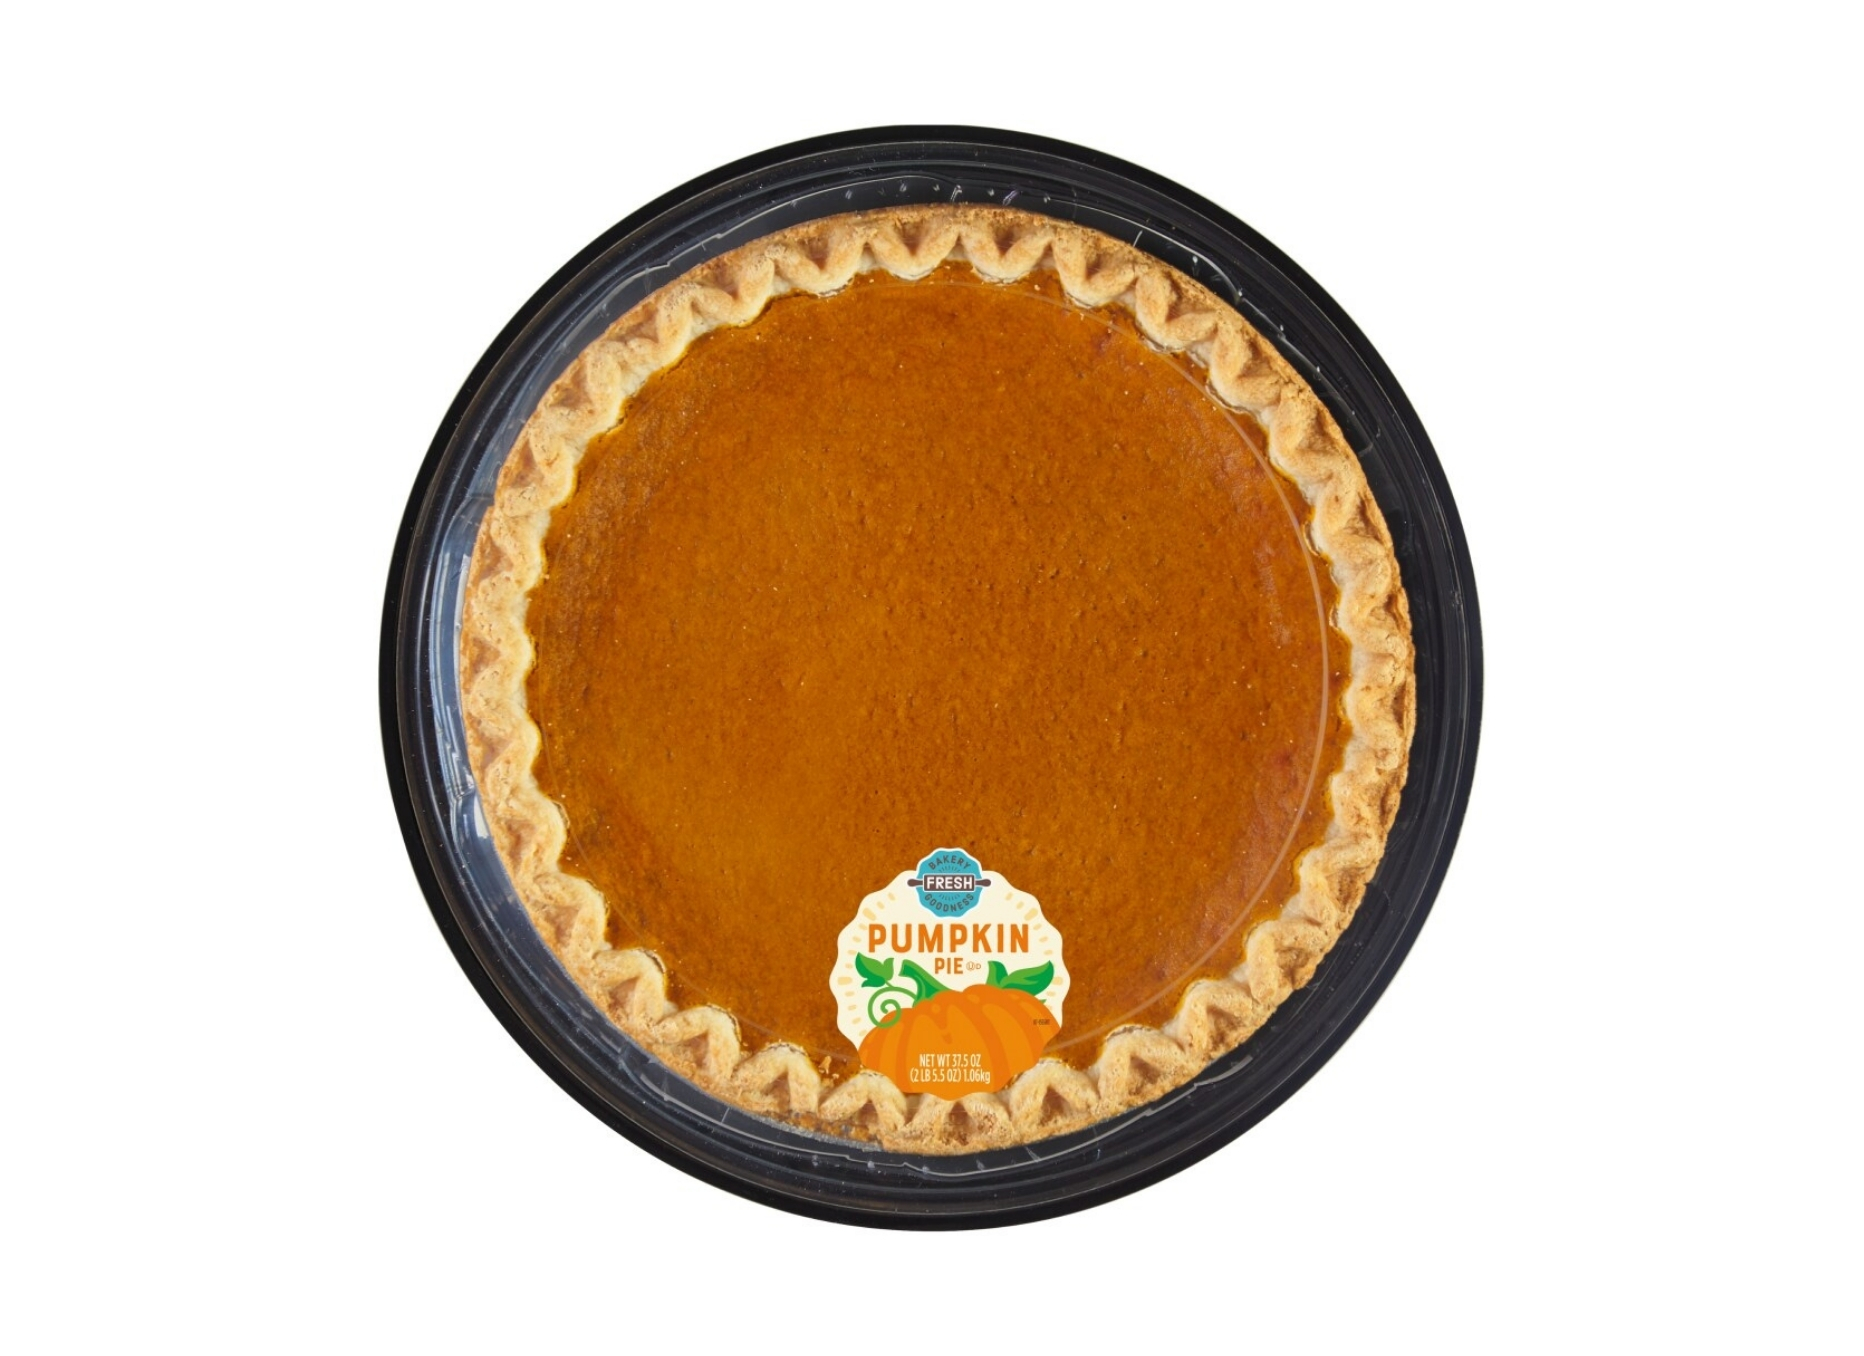 Kroger Pumpkin Pie